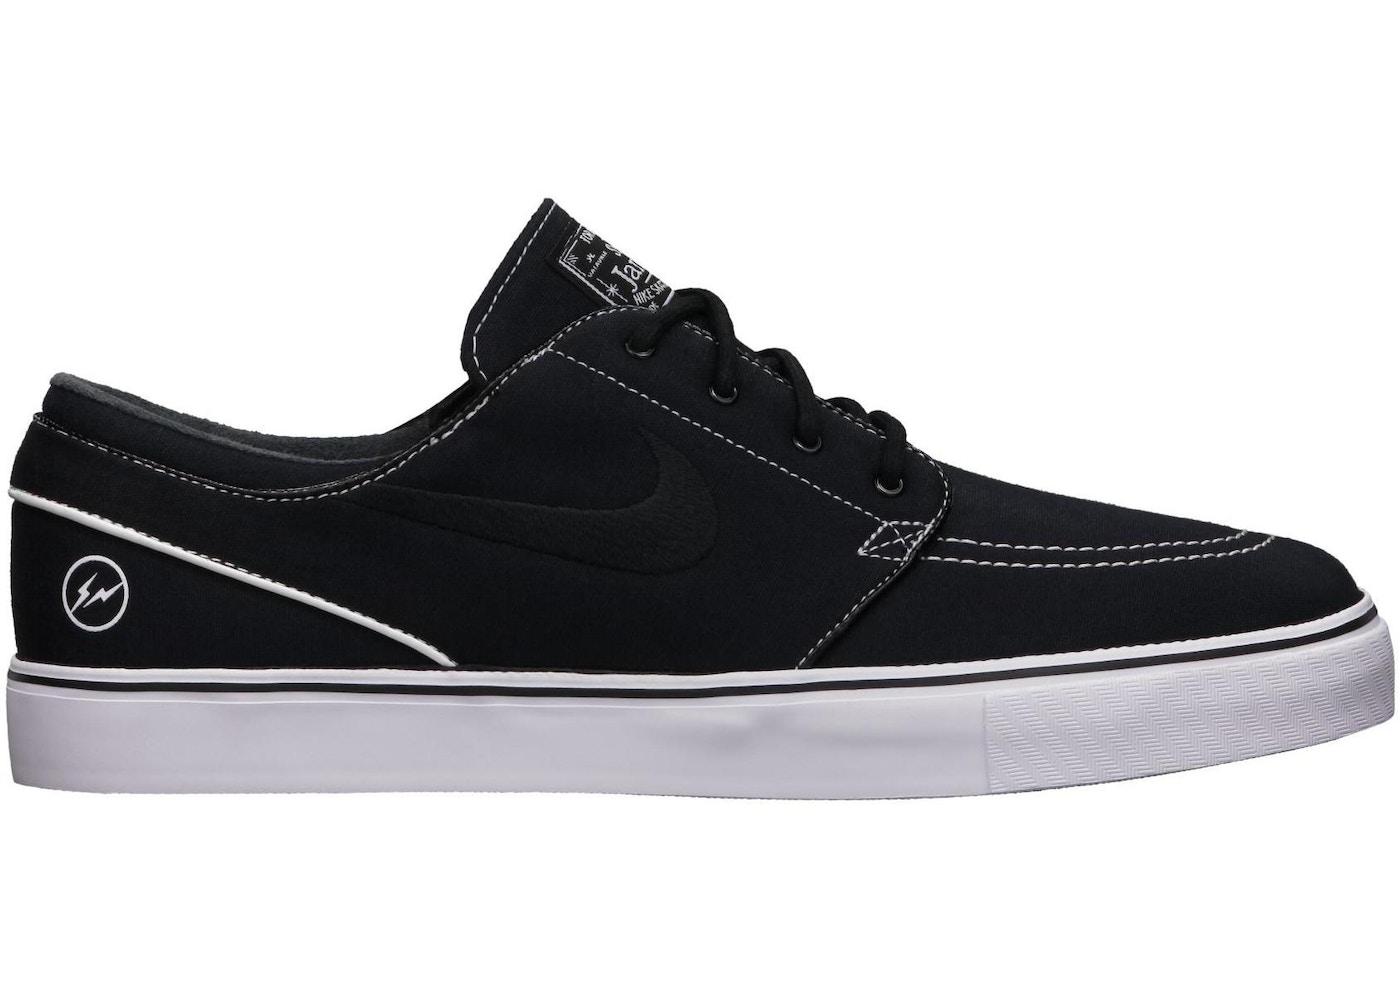 c0055102 Nike SB Stefan Janoski Fragment Black - 628982-001